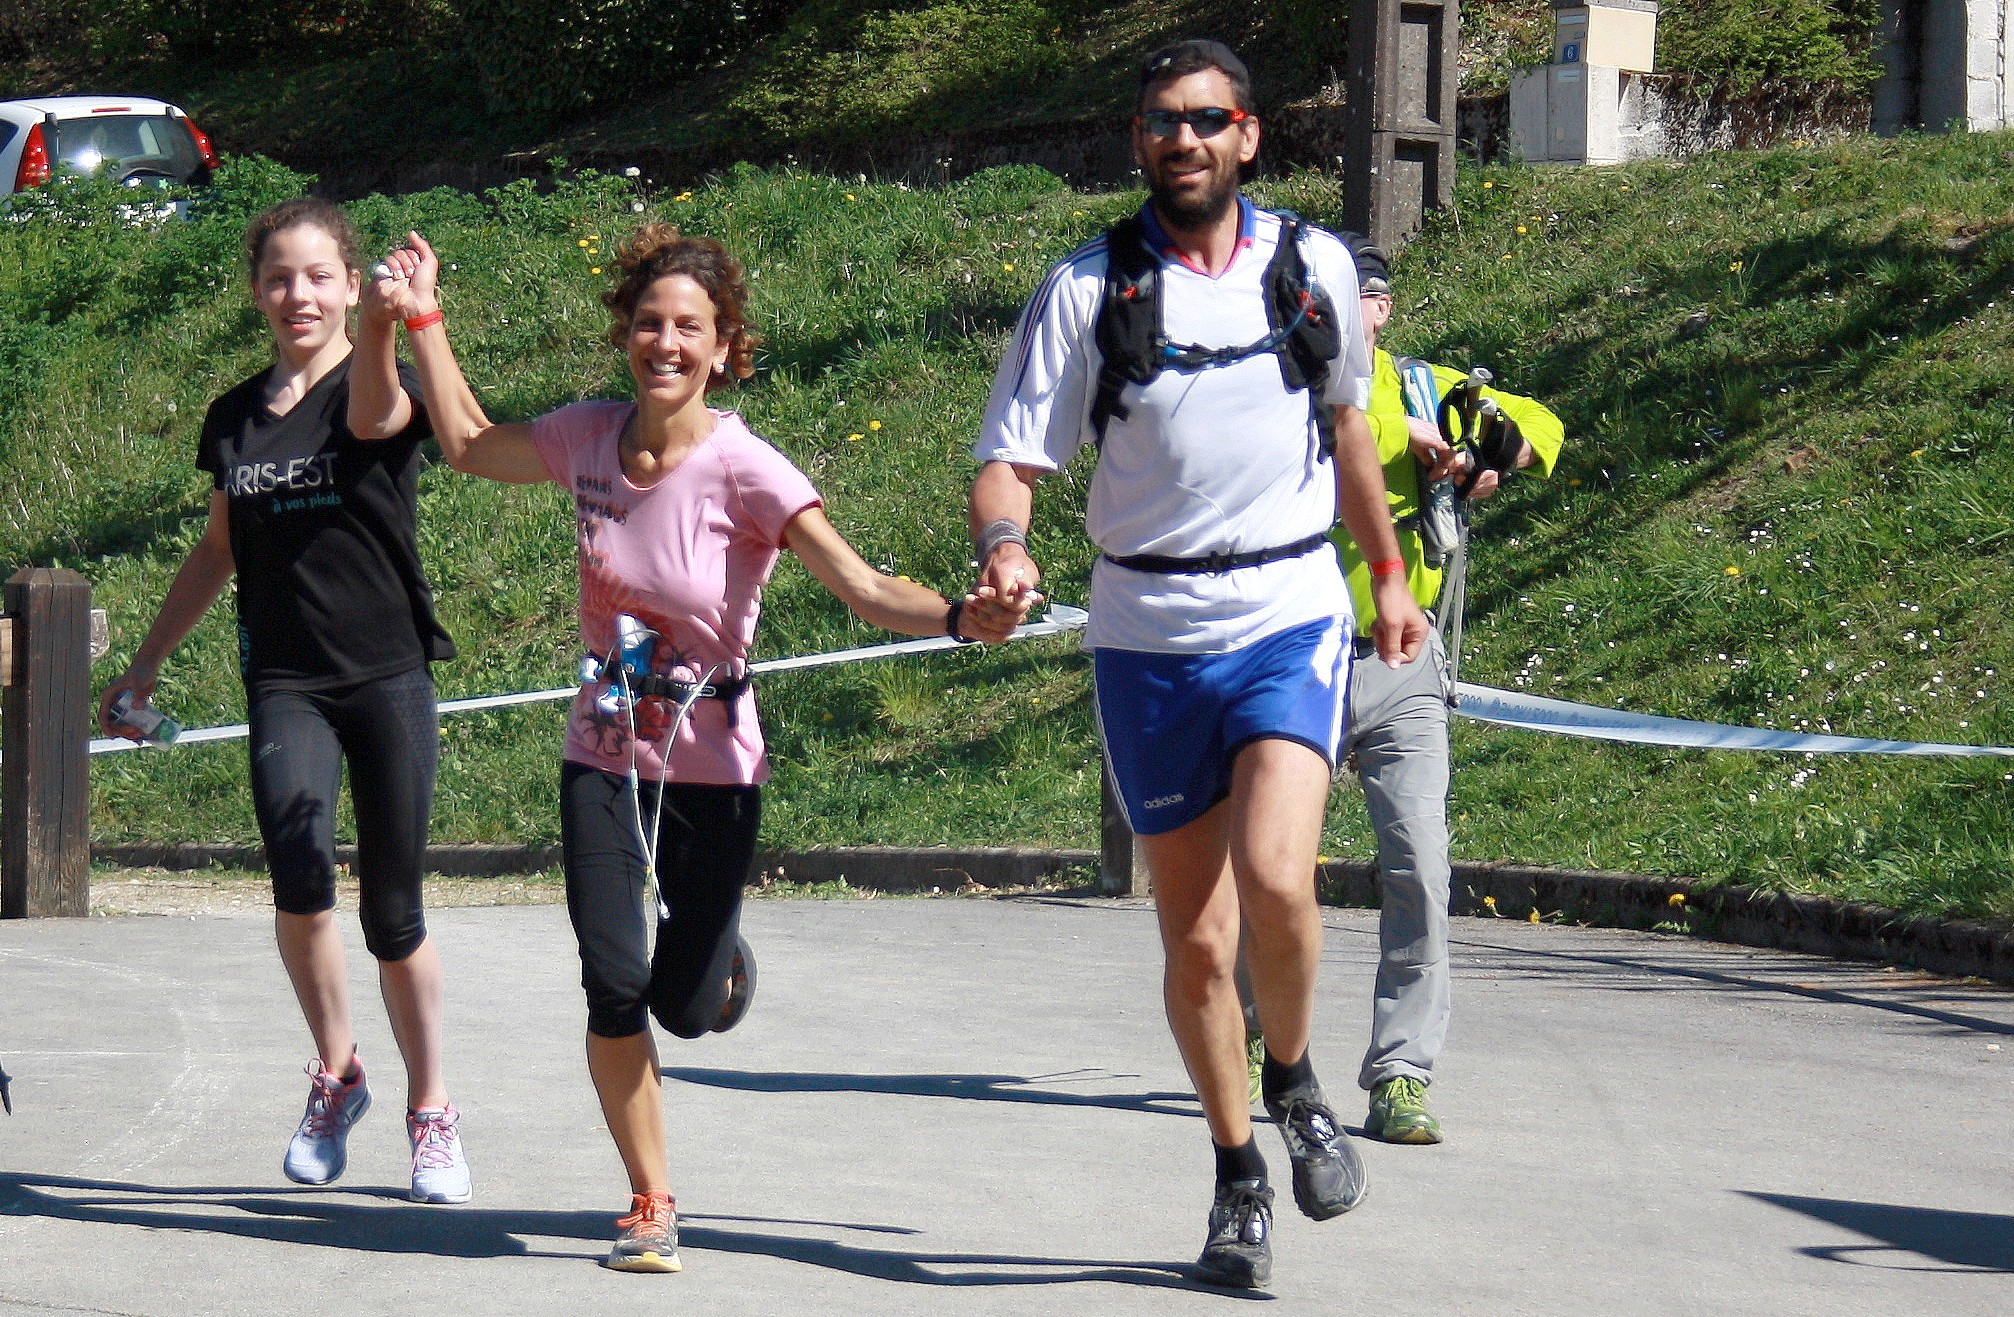 2017-04-09 - Trail-Montfaucon (362)